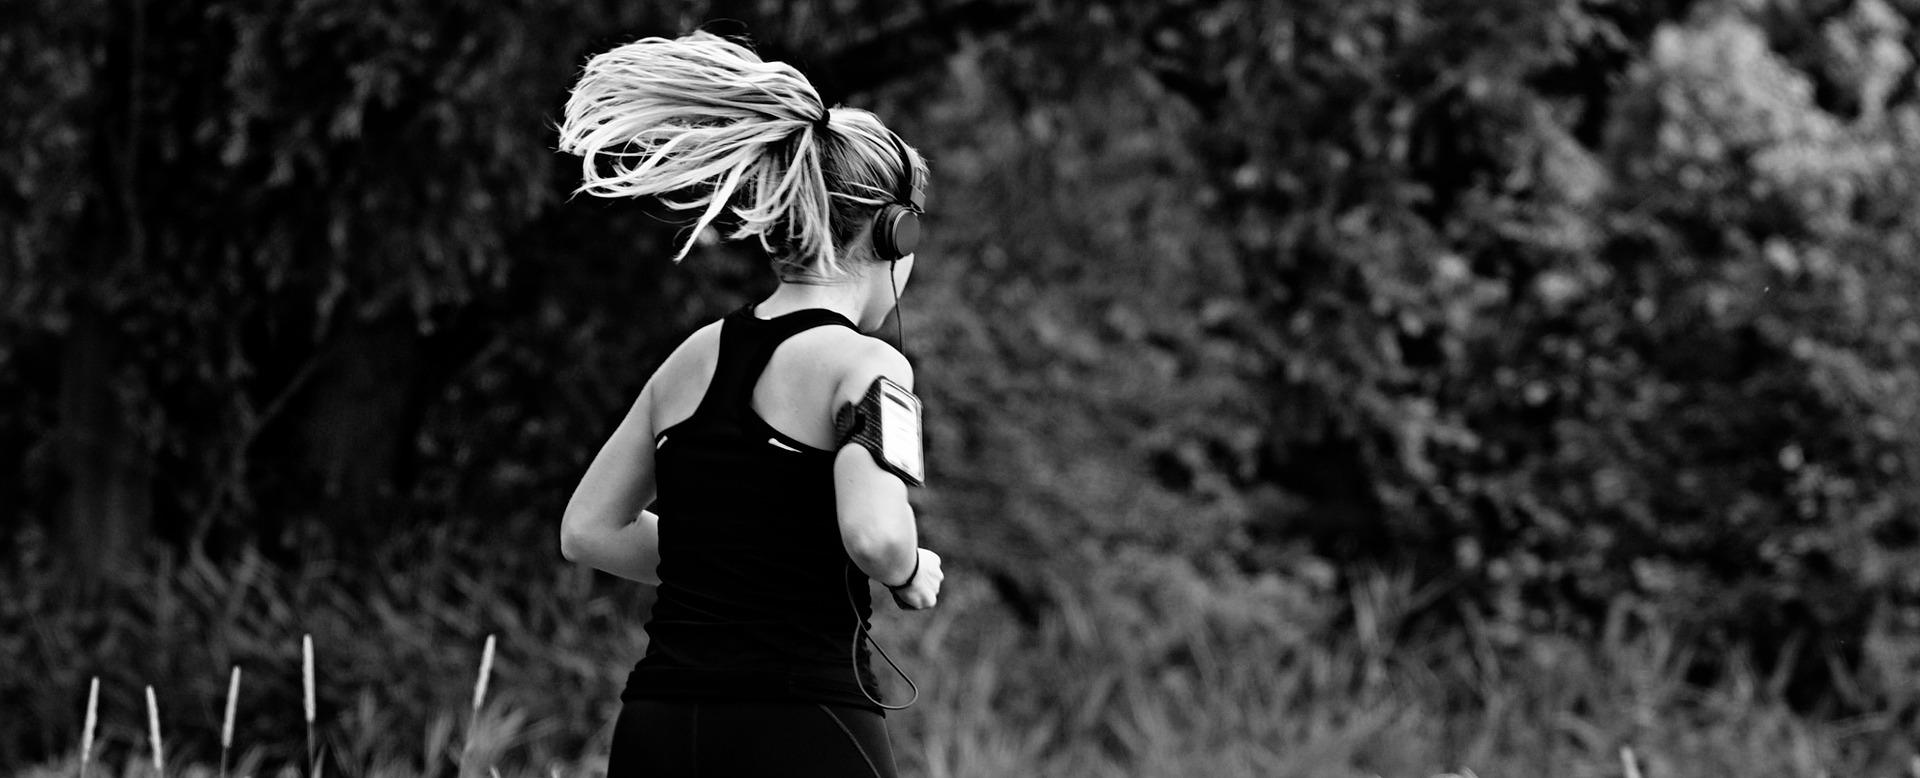 Woman Running - Healthy Heart